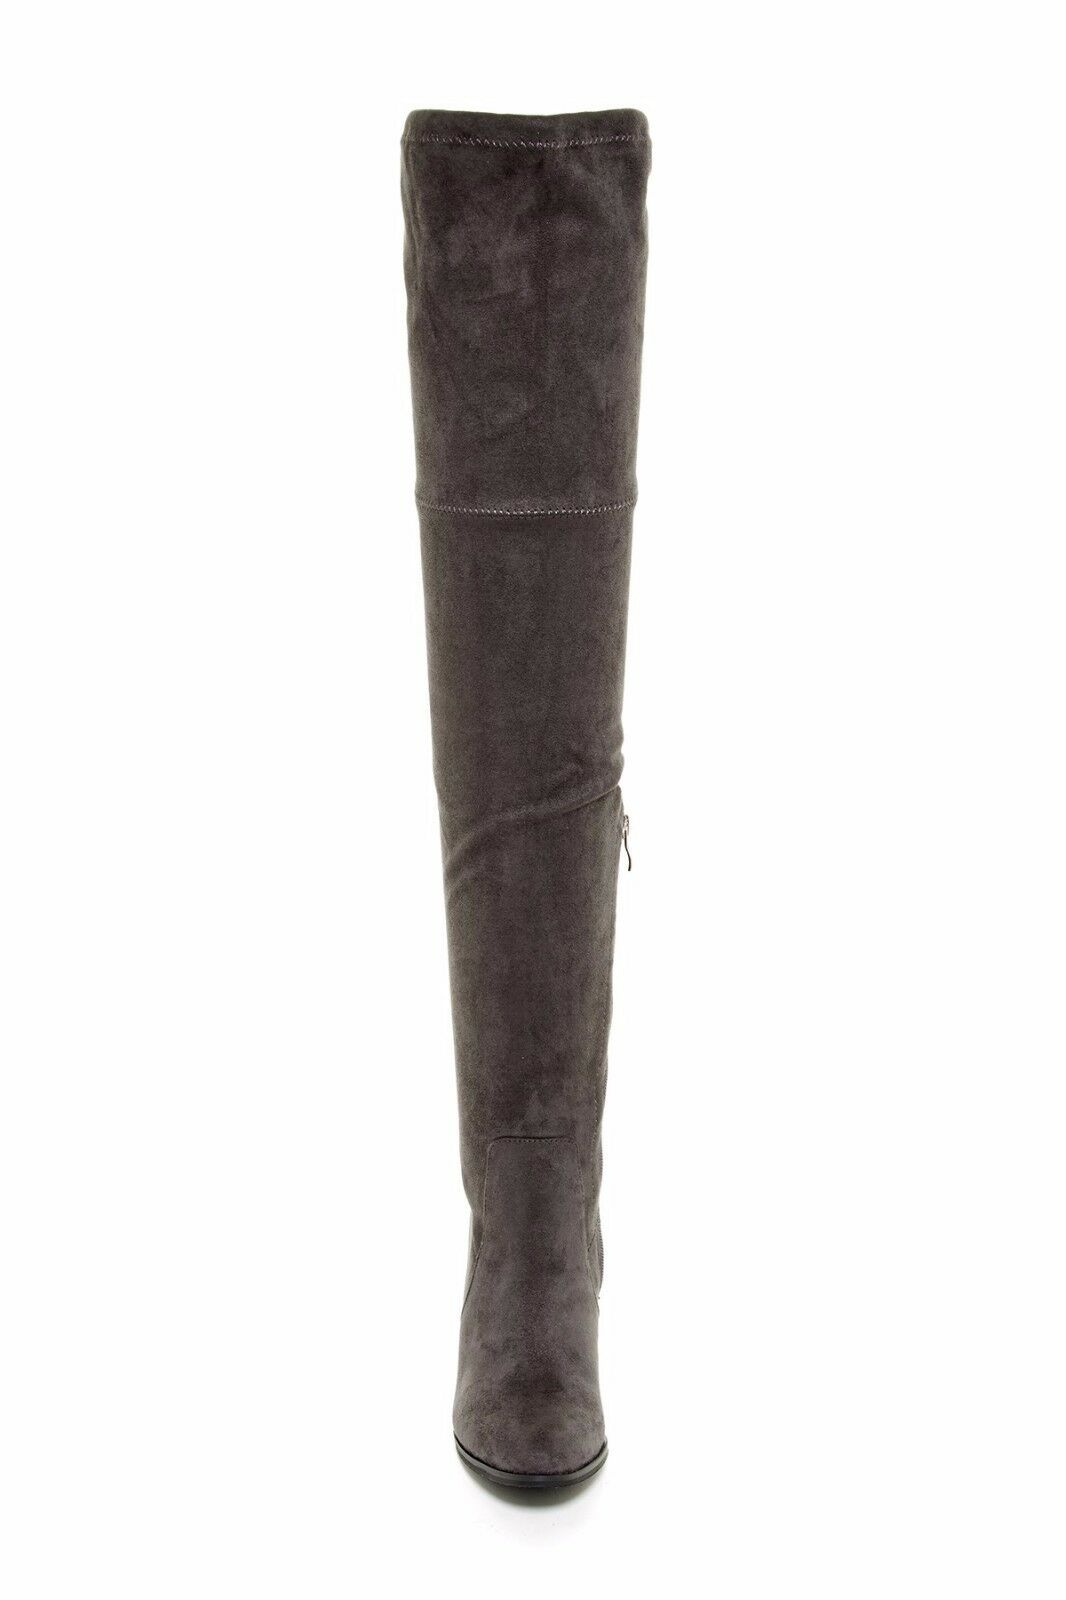 New Catherine Catherine Catherine Catherine Malandrino Sorcha OverTheKnee Grau Boot Damens's sz  8.5 33ac5b